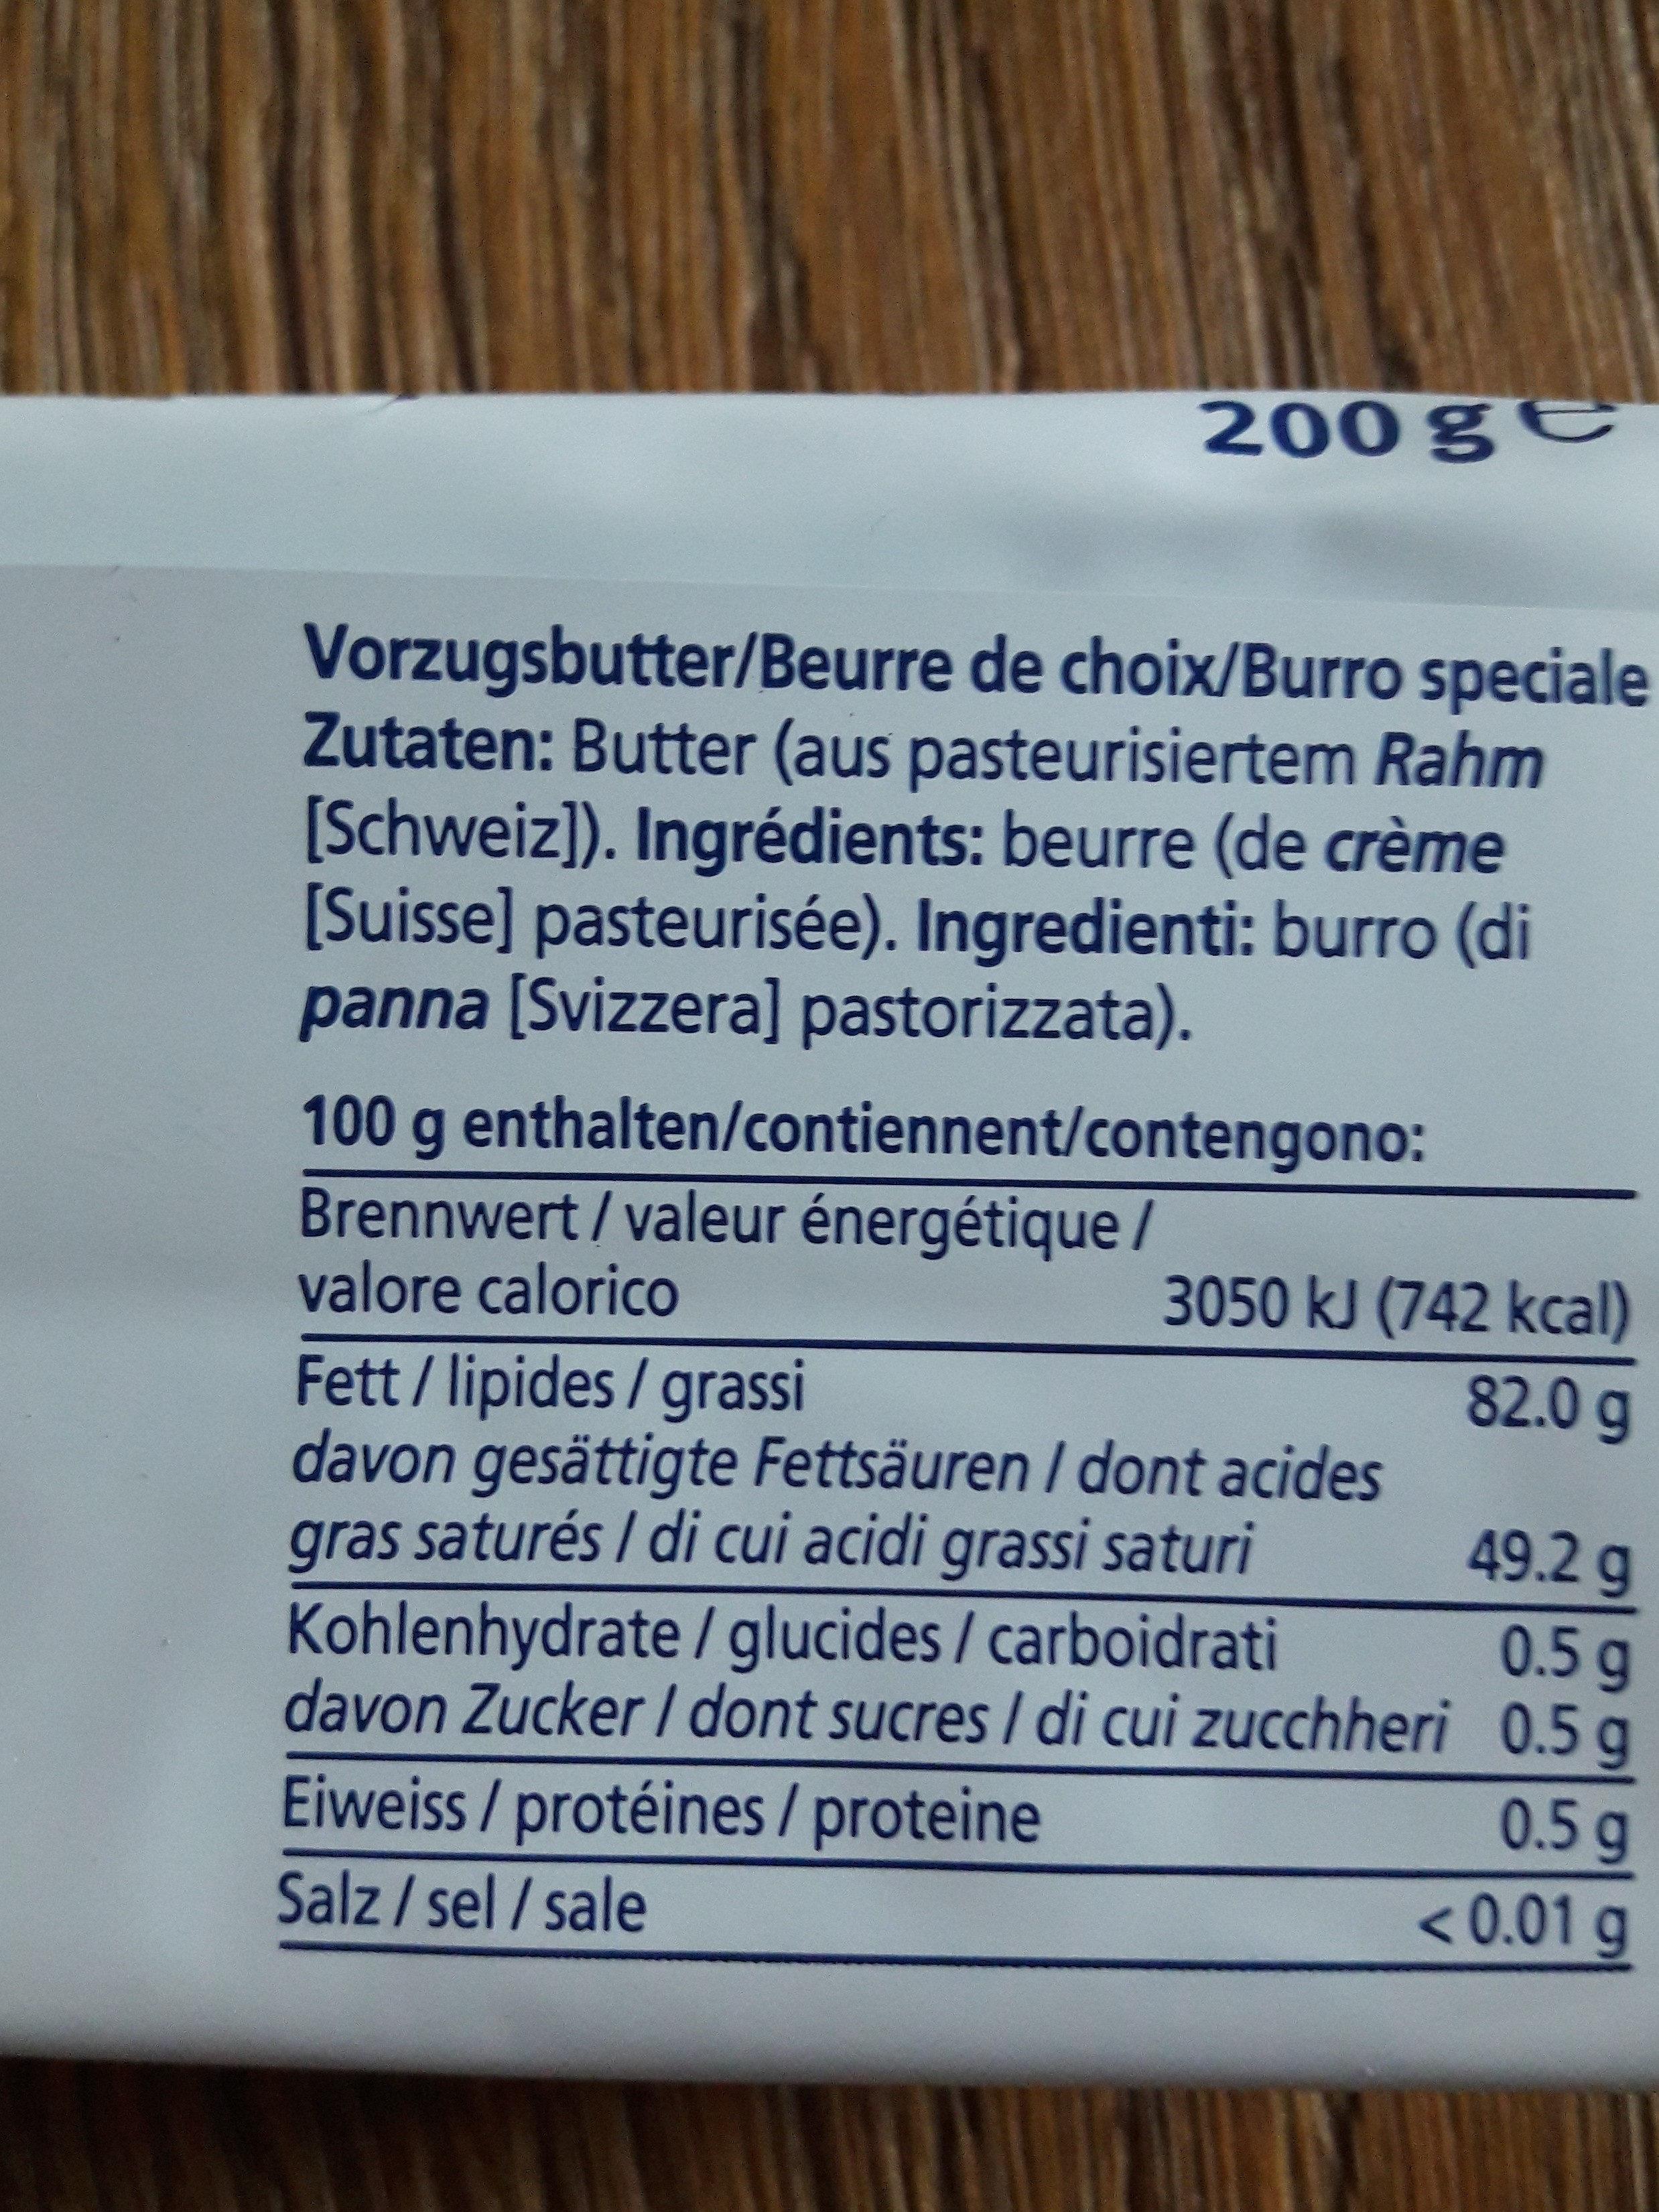 Beurre de choix - Ingrediënten - fr